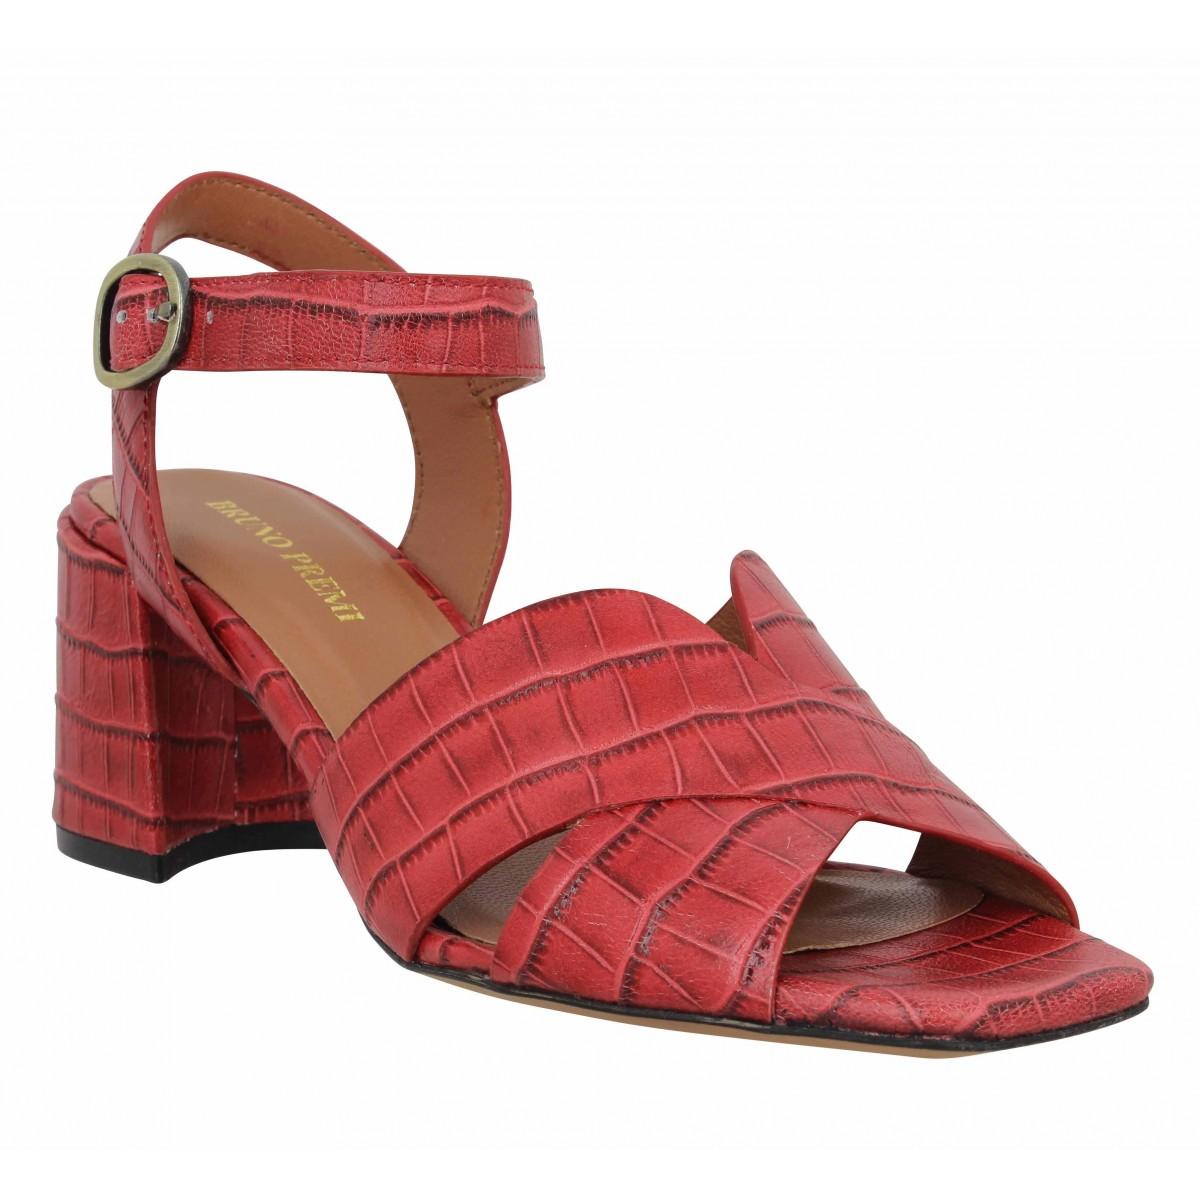 Sandales talons BRUNO PREMI 503 cuir Femme Rouge